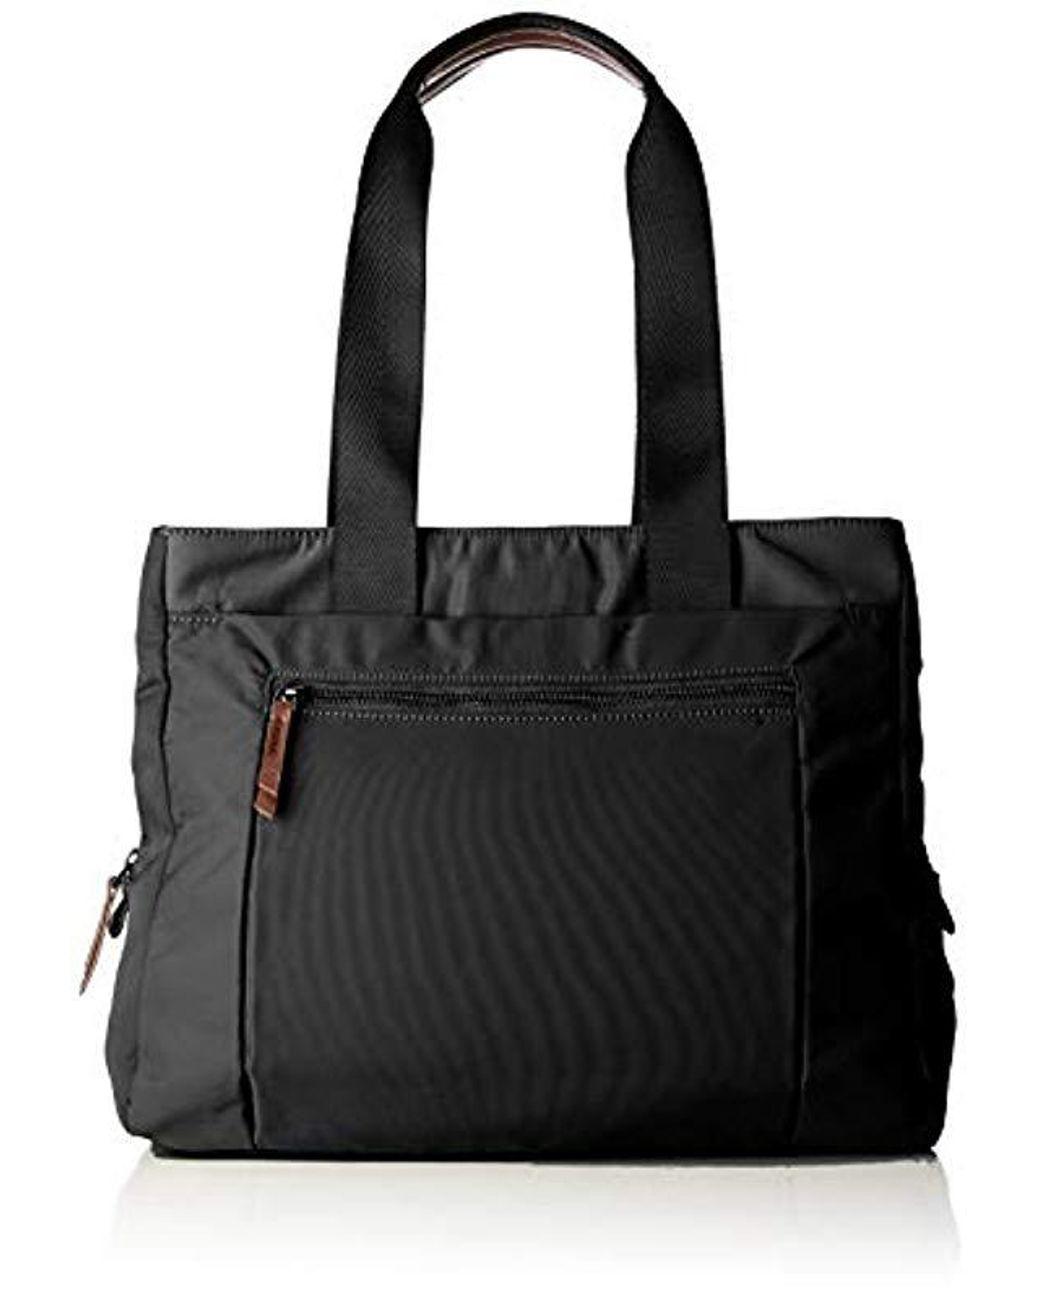 Details about Womens Clarks Light Weight Shoulder Bag Raina Lea